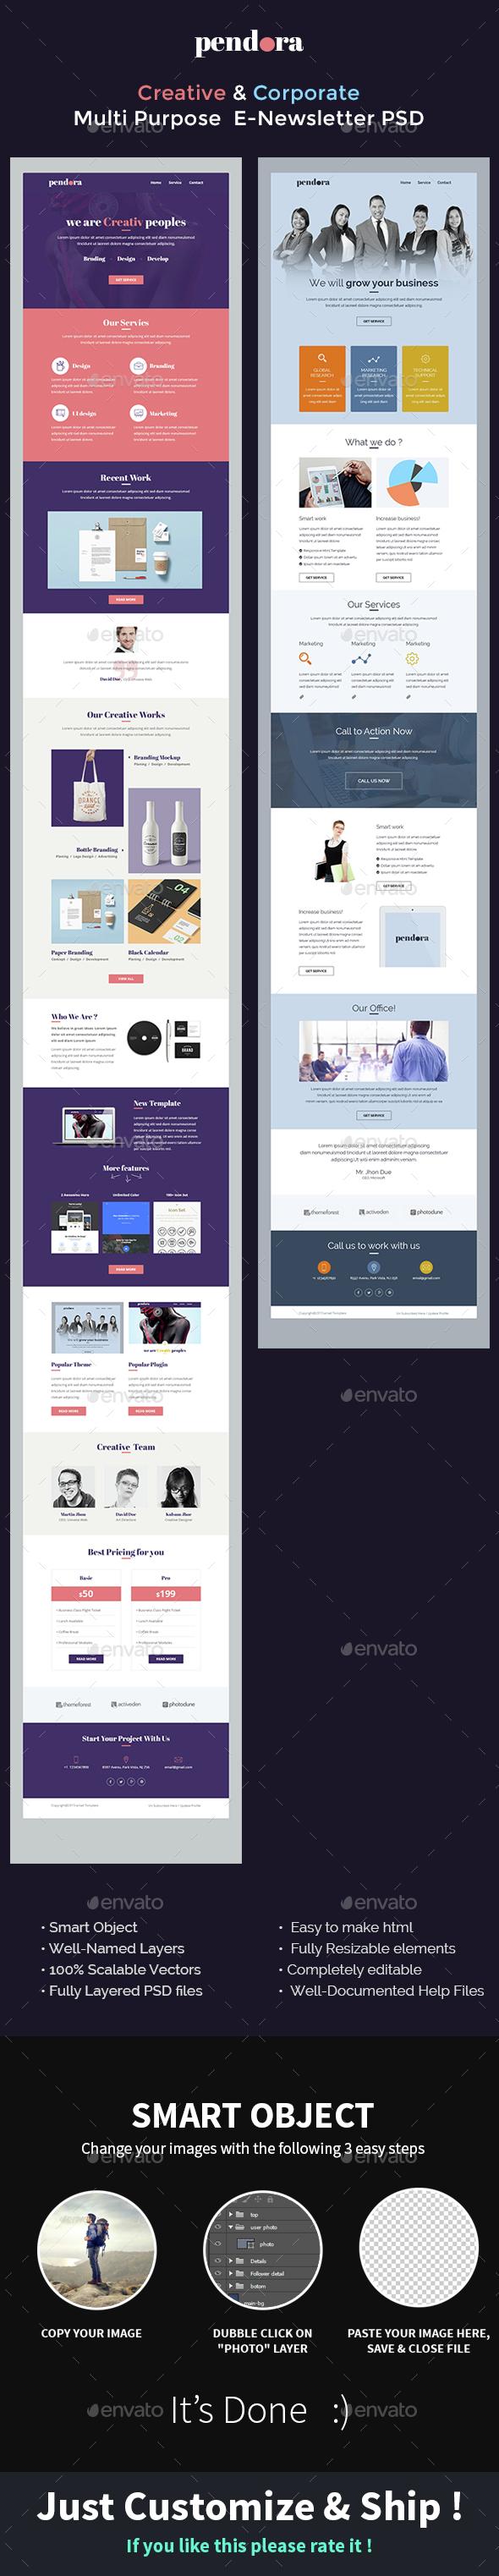 Creative & Corporate - Multi Purpose E-Newsletter PSD Template - Pendora  - E-newsletters Web Elements